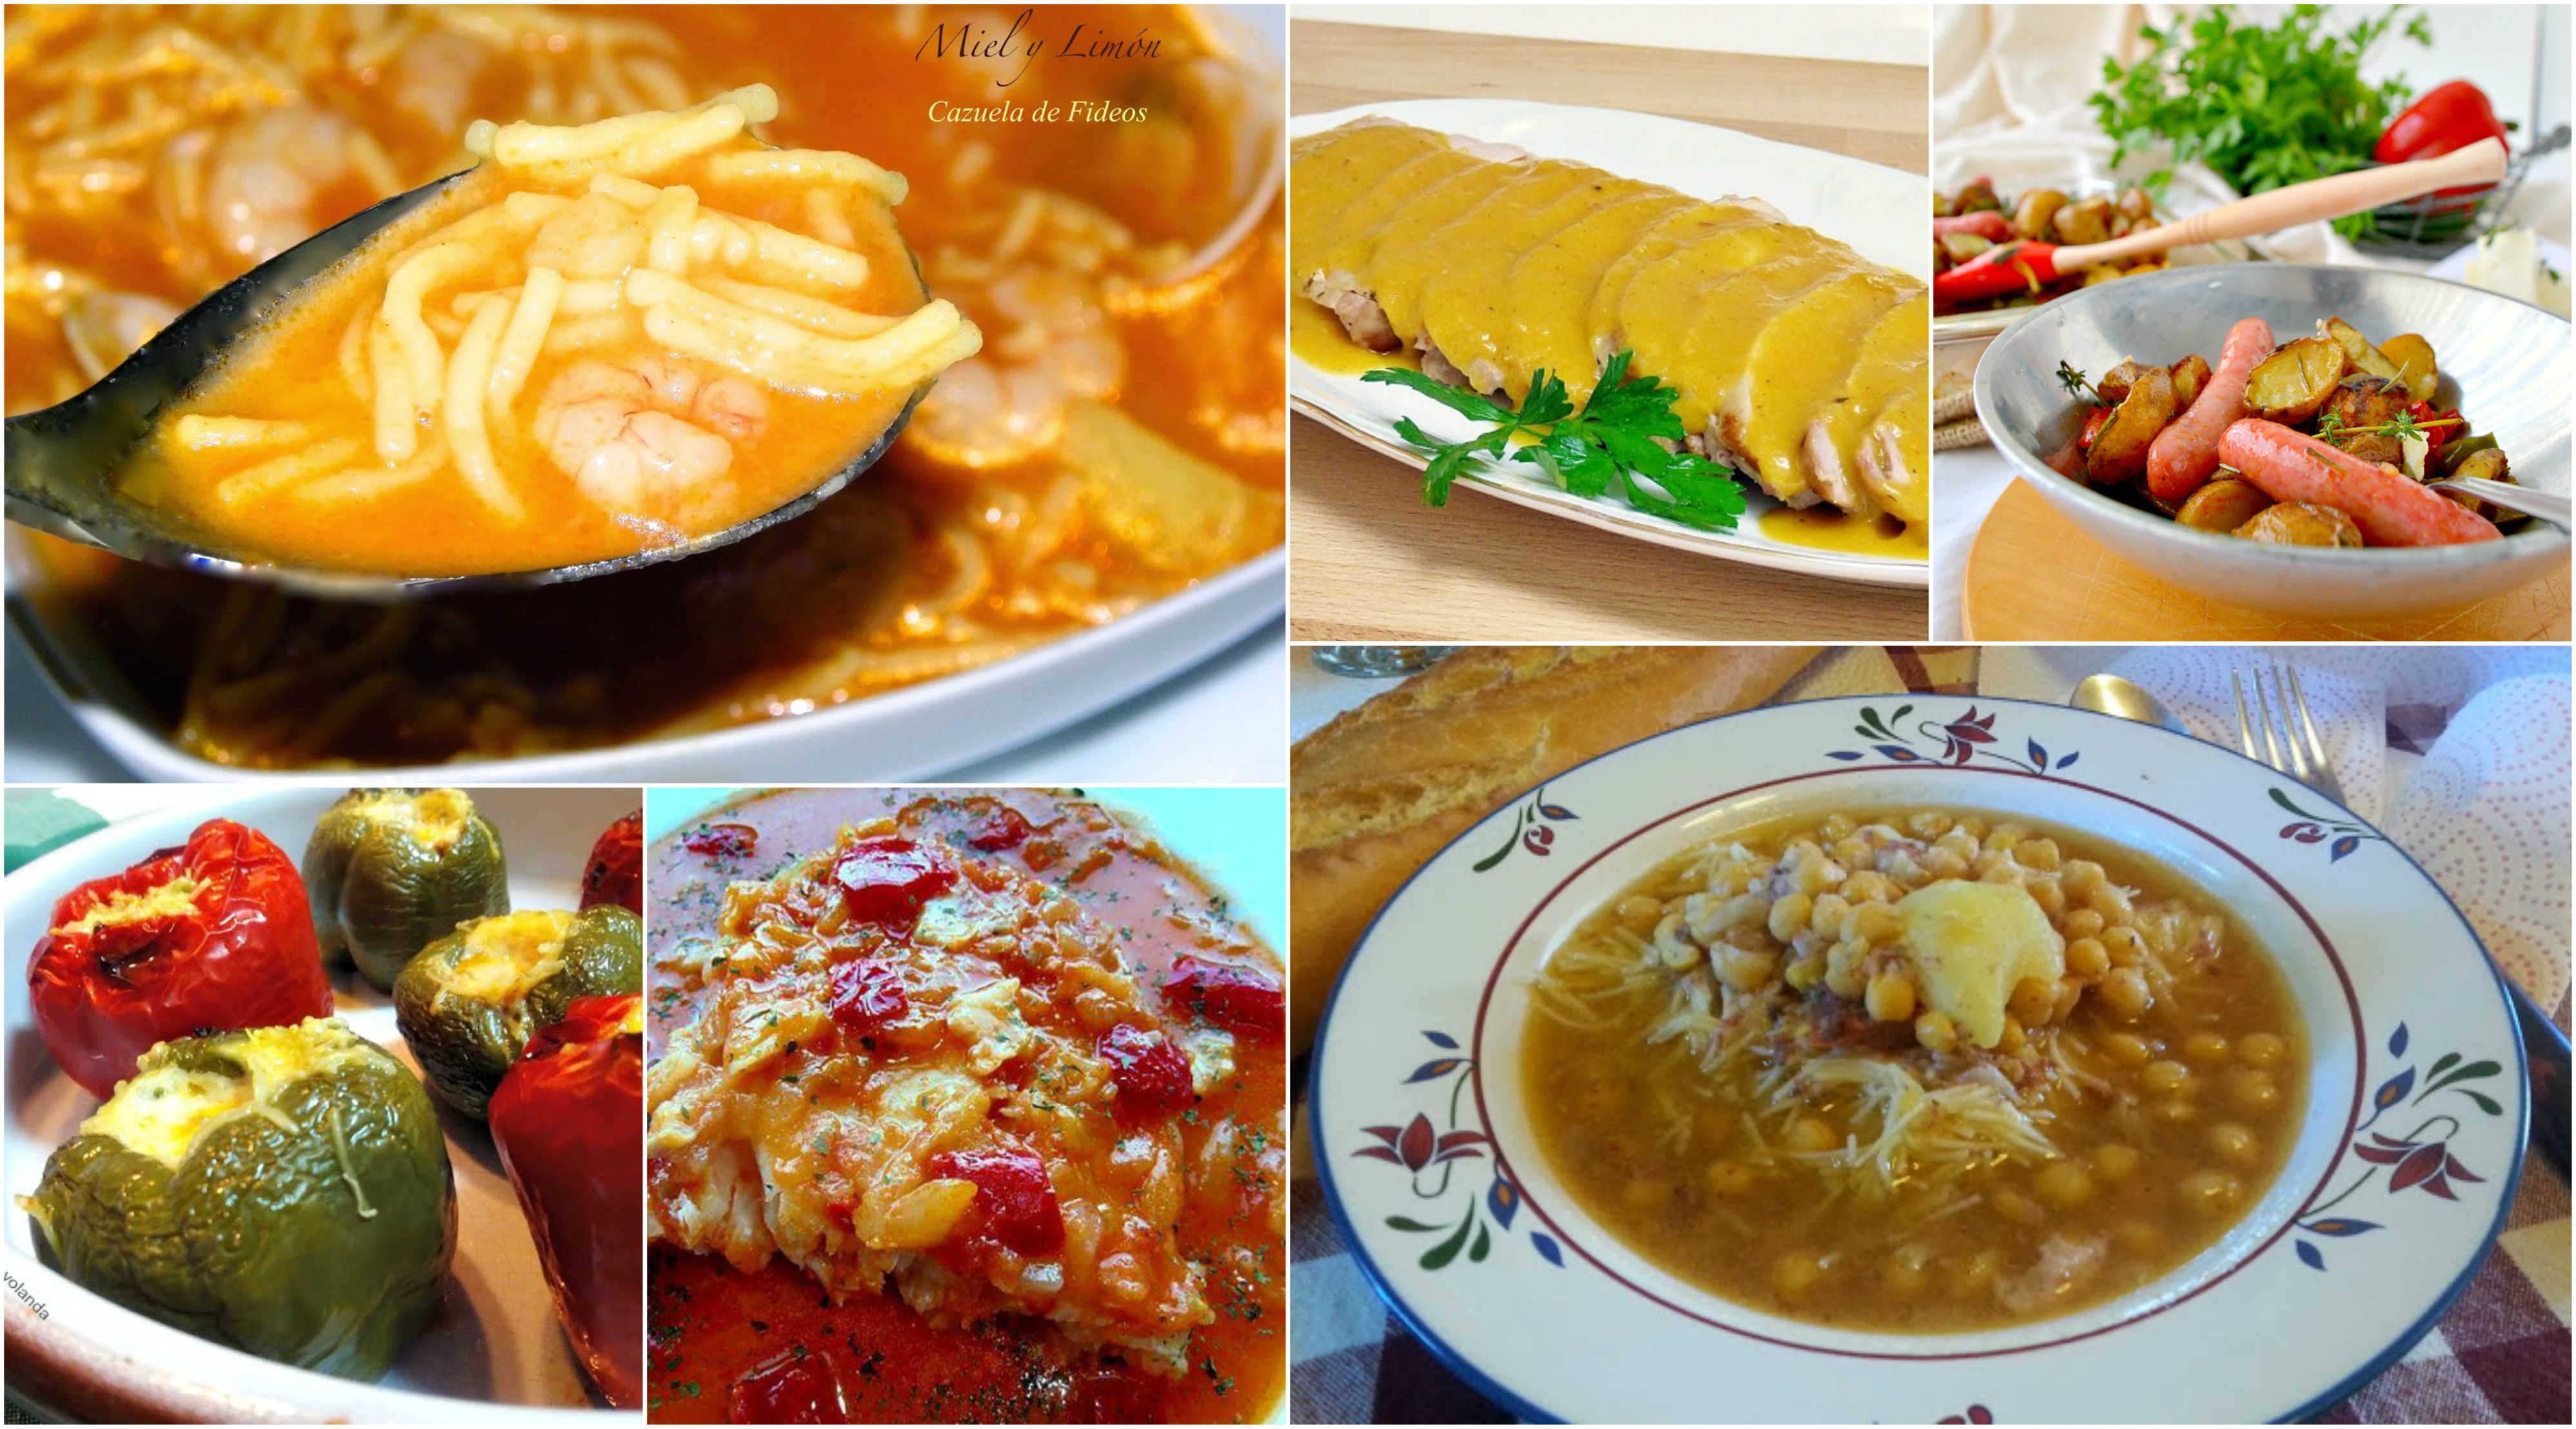 Men semanal 37 siete d as siete platos la cocina de for Platos de cocina